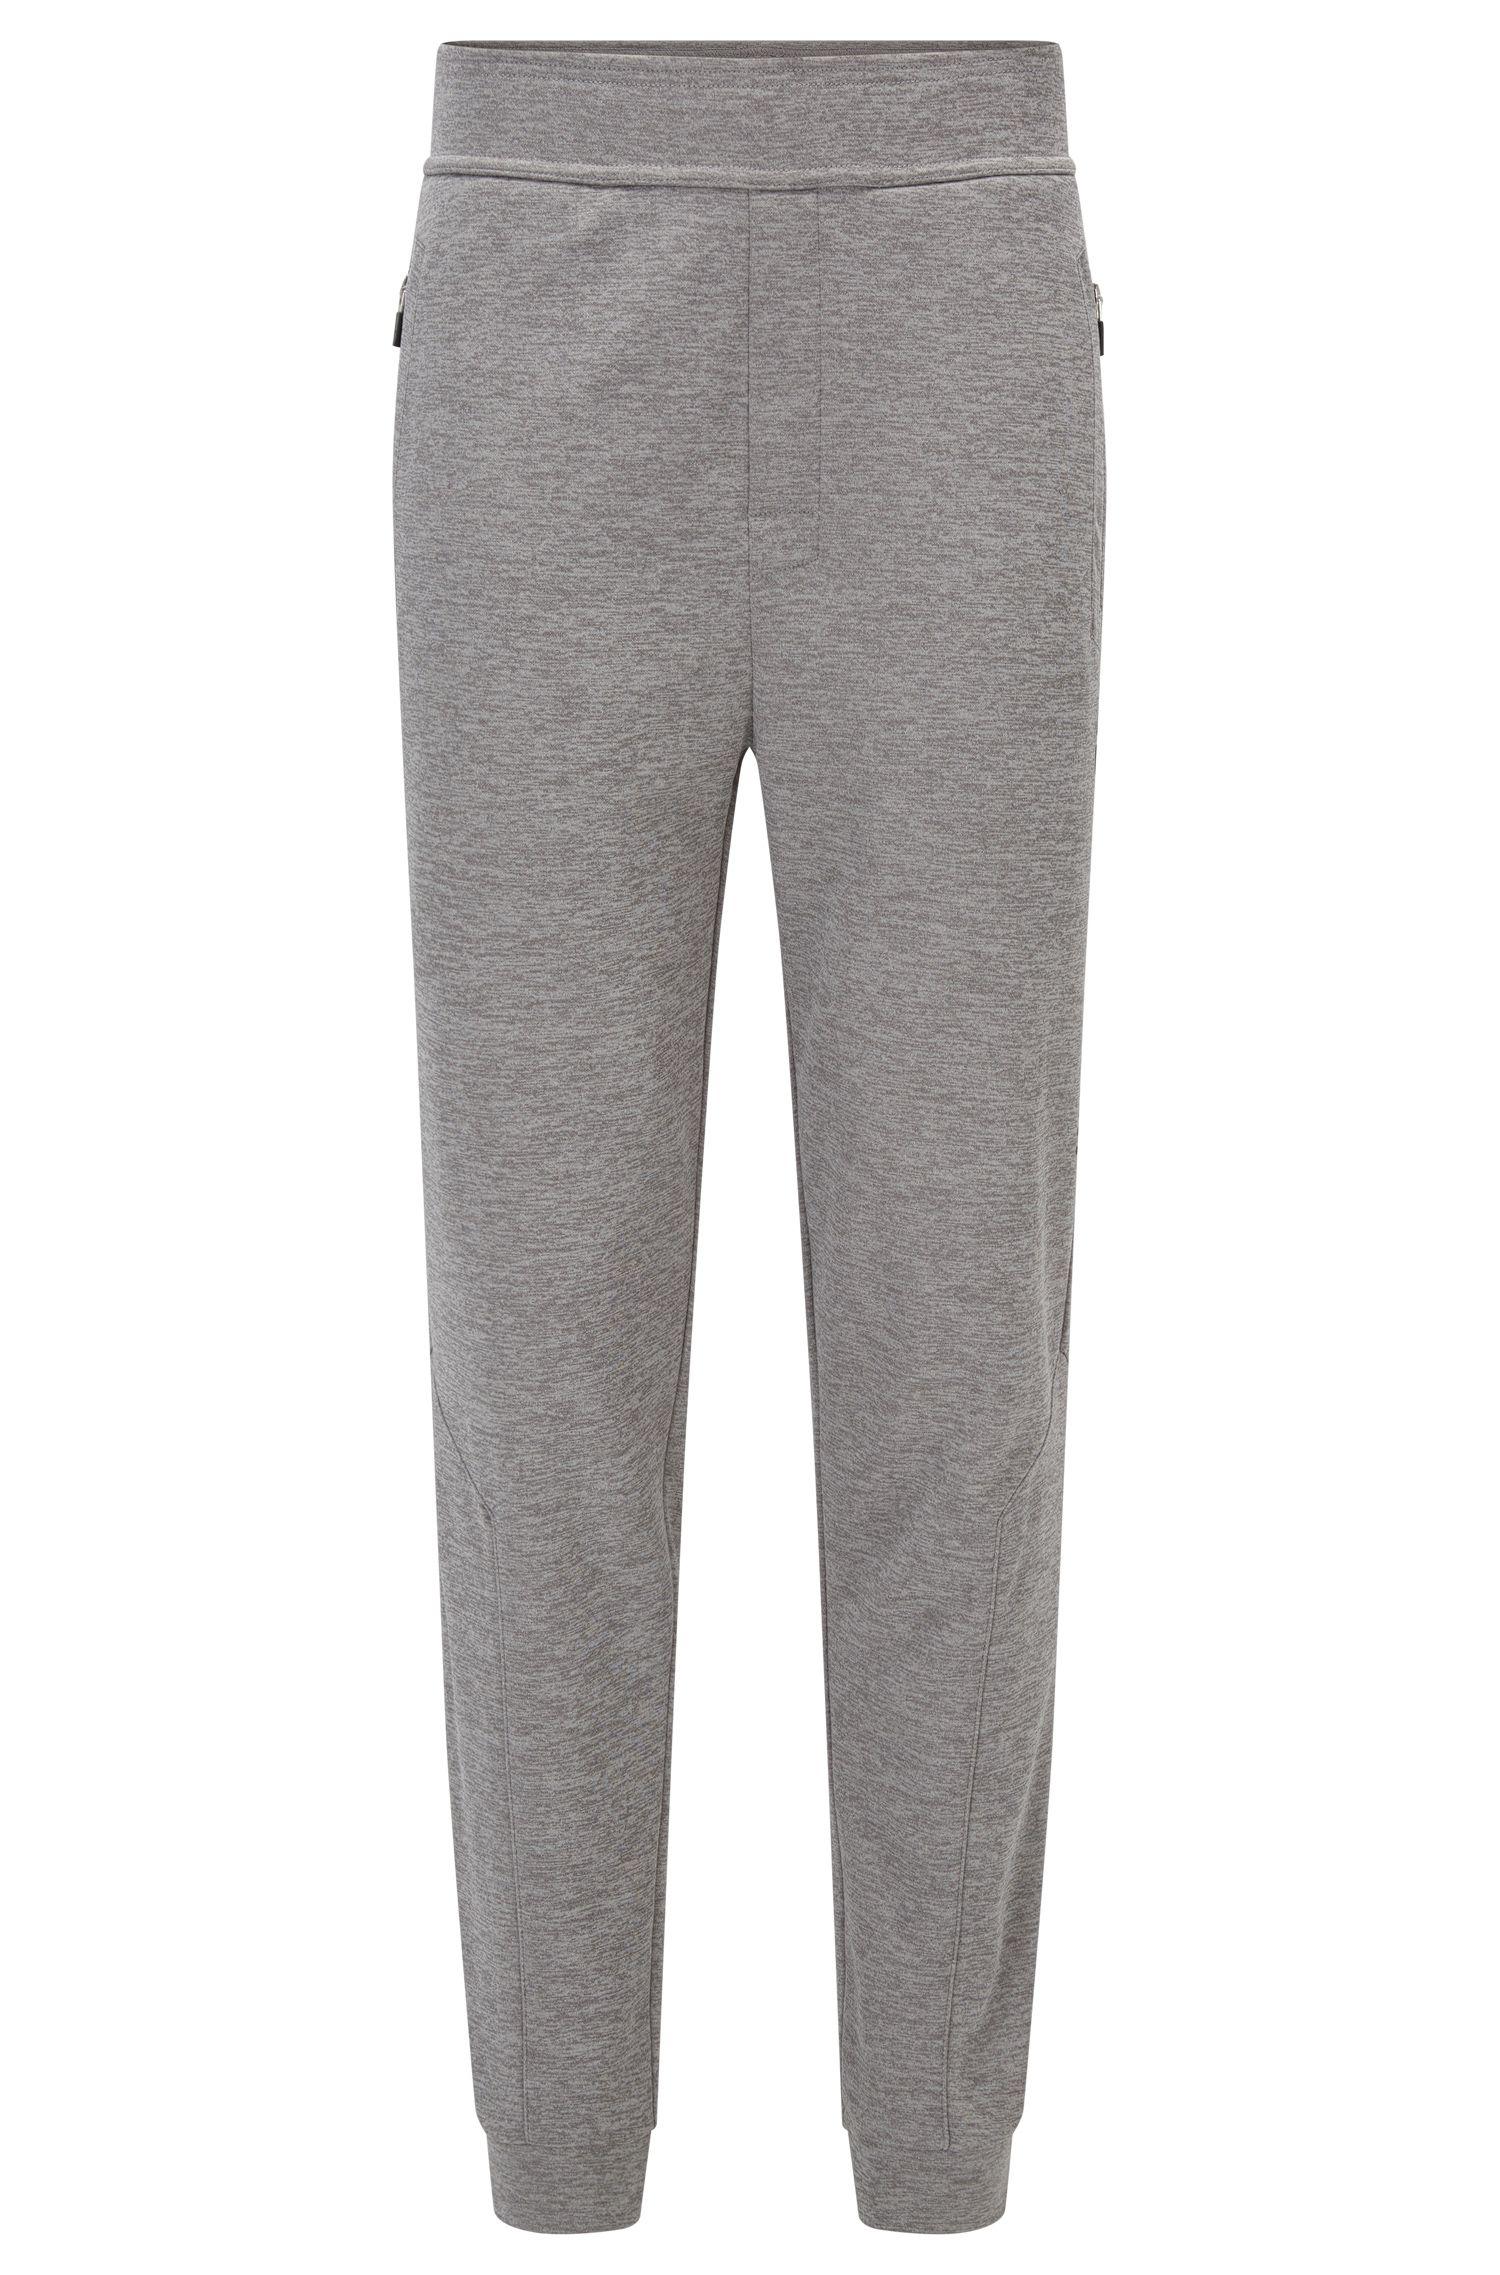 Stretch Cotton Lounge Pant   Long Pant Cuffs